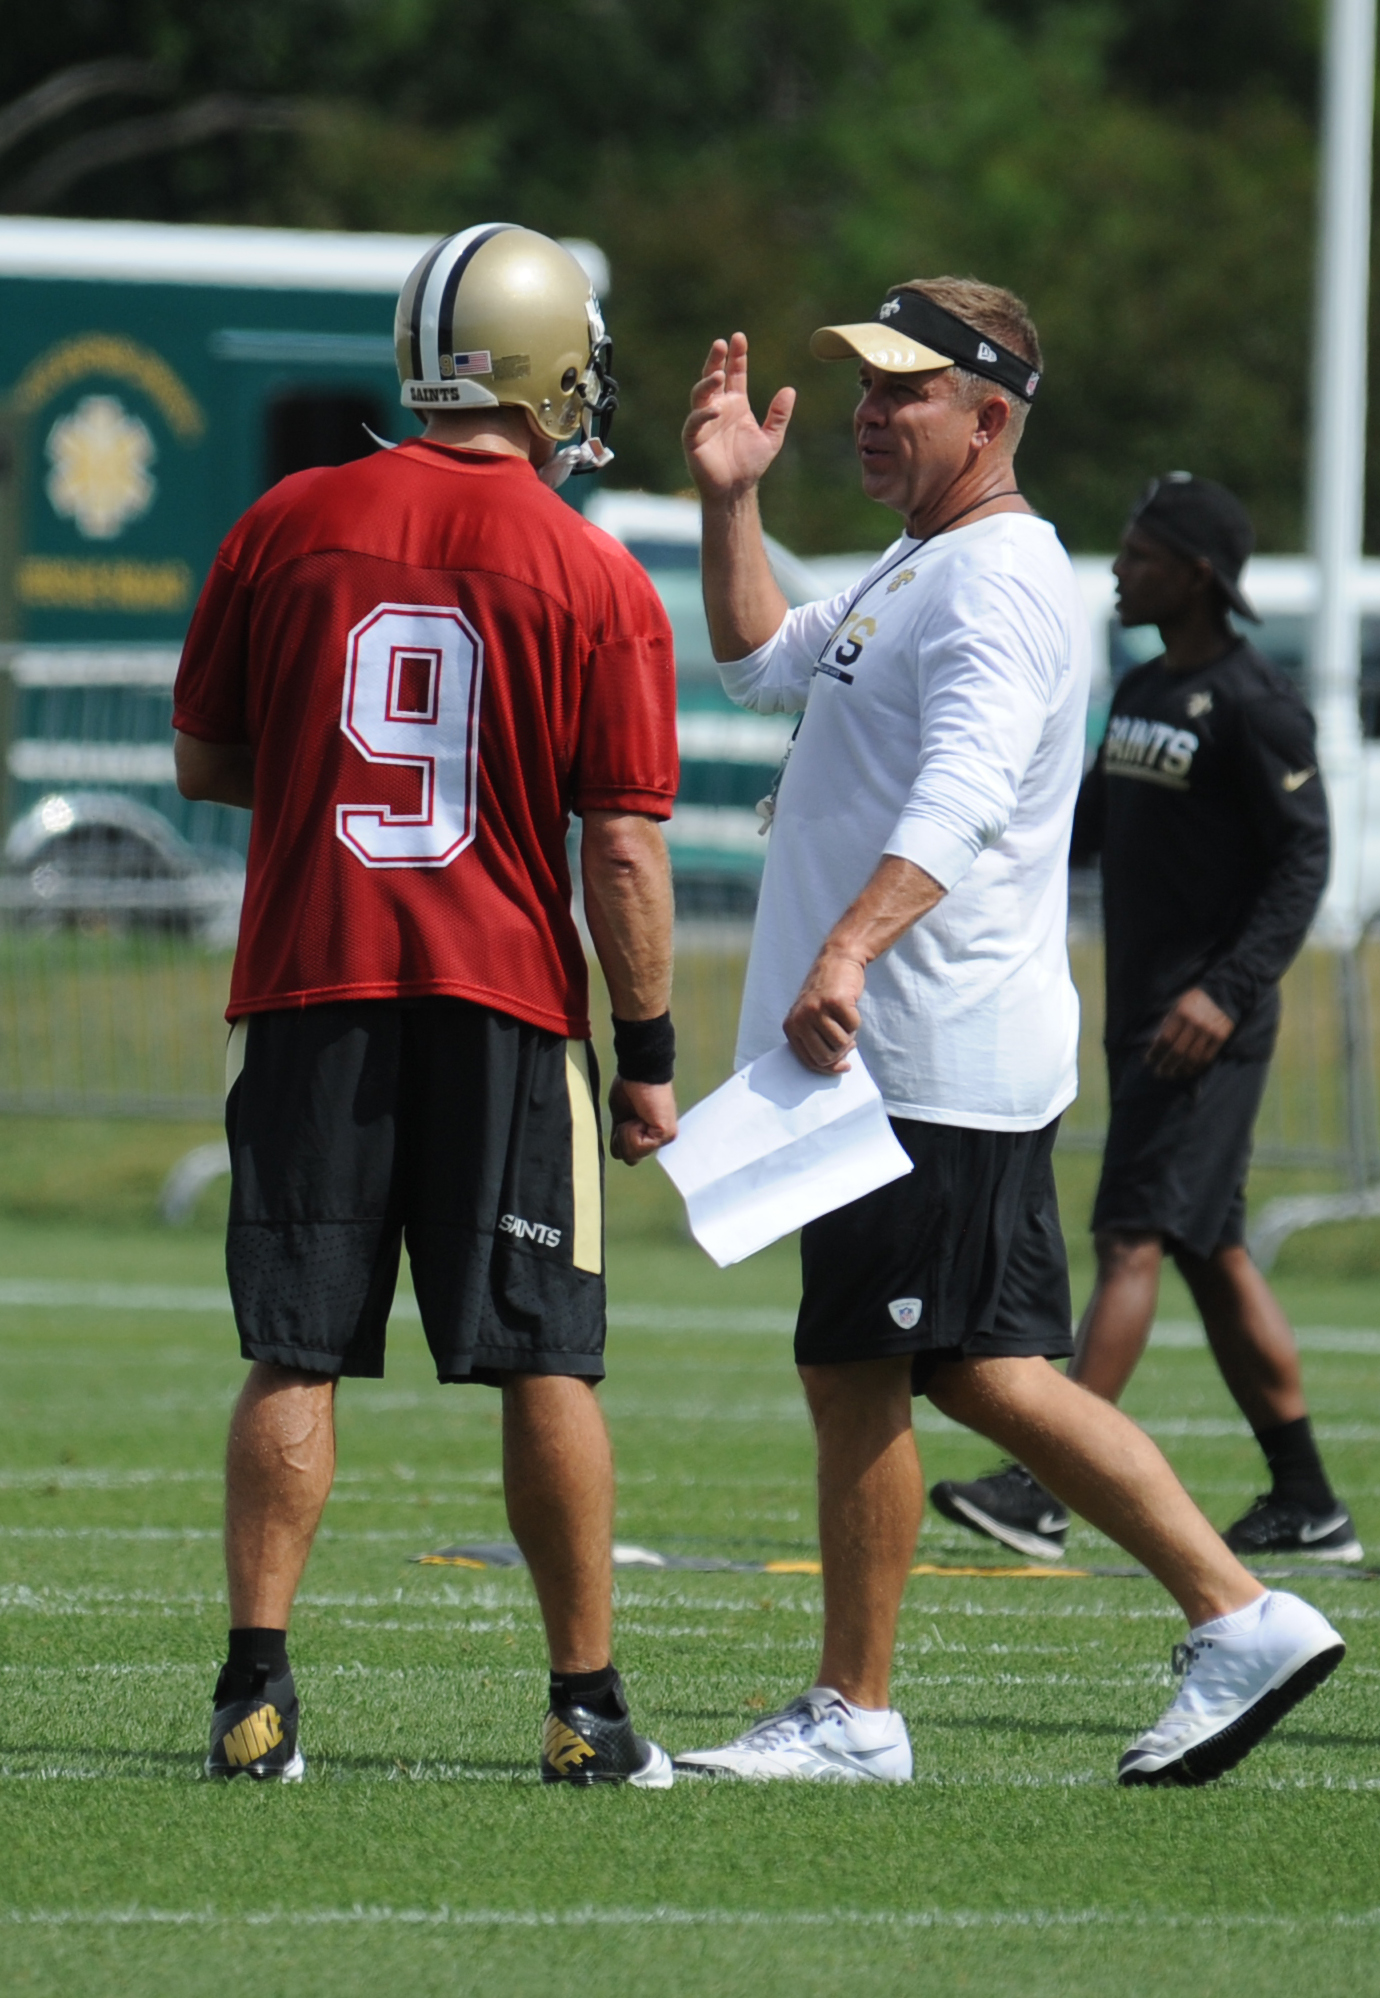 New Orleans Saints quarterback Drew Brees (9) talks with head coach Sean Payton during the NFL football teams  training camp in White Sulphur Springs, W.Va., Thursday, July 28, 2016. (AP Photo/Chris Tilley)